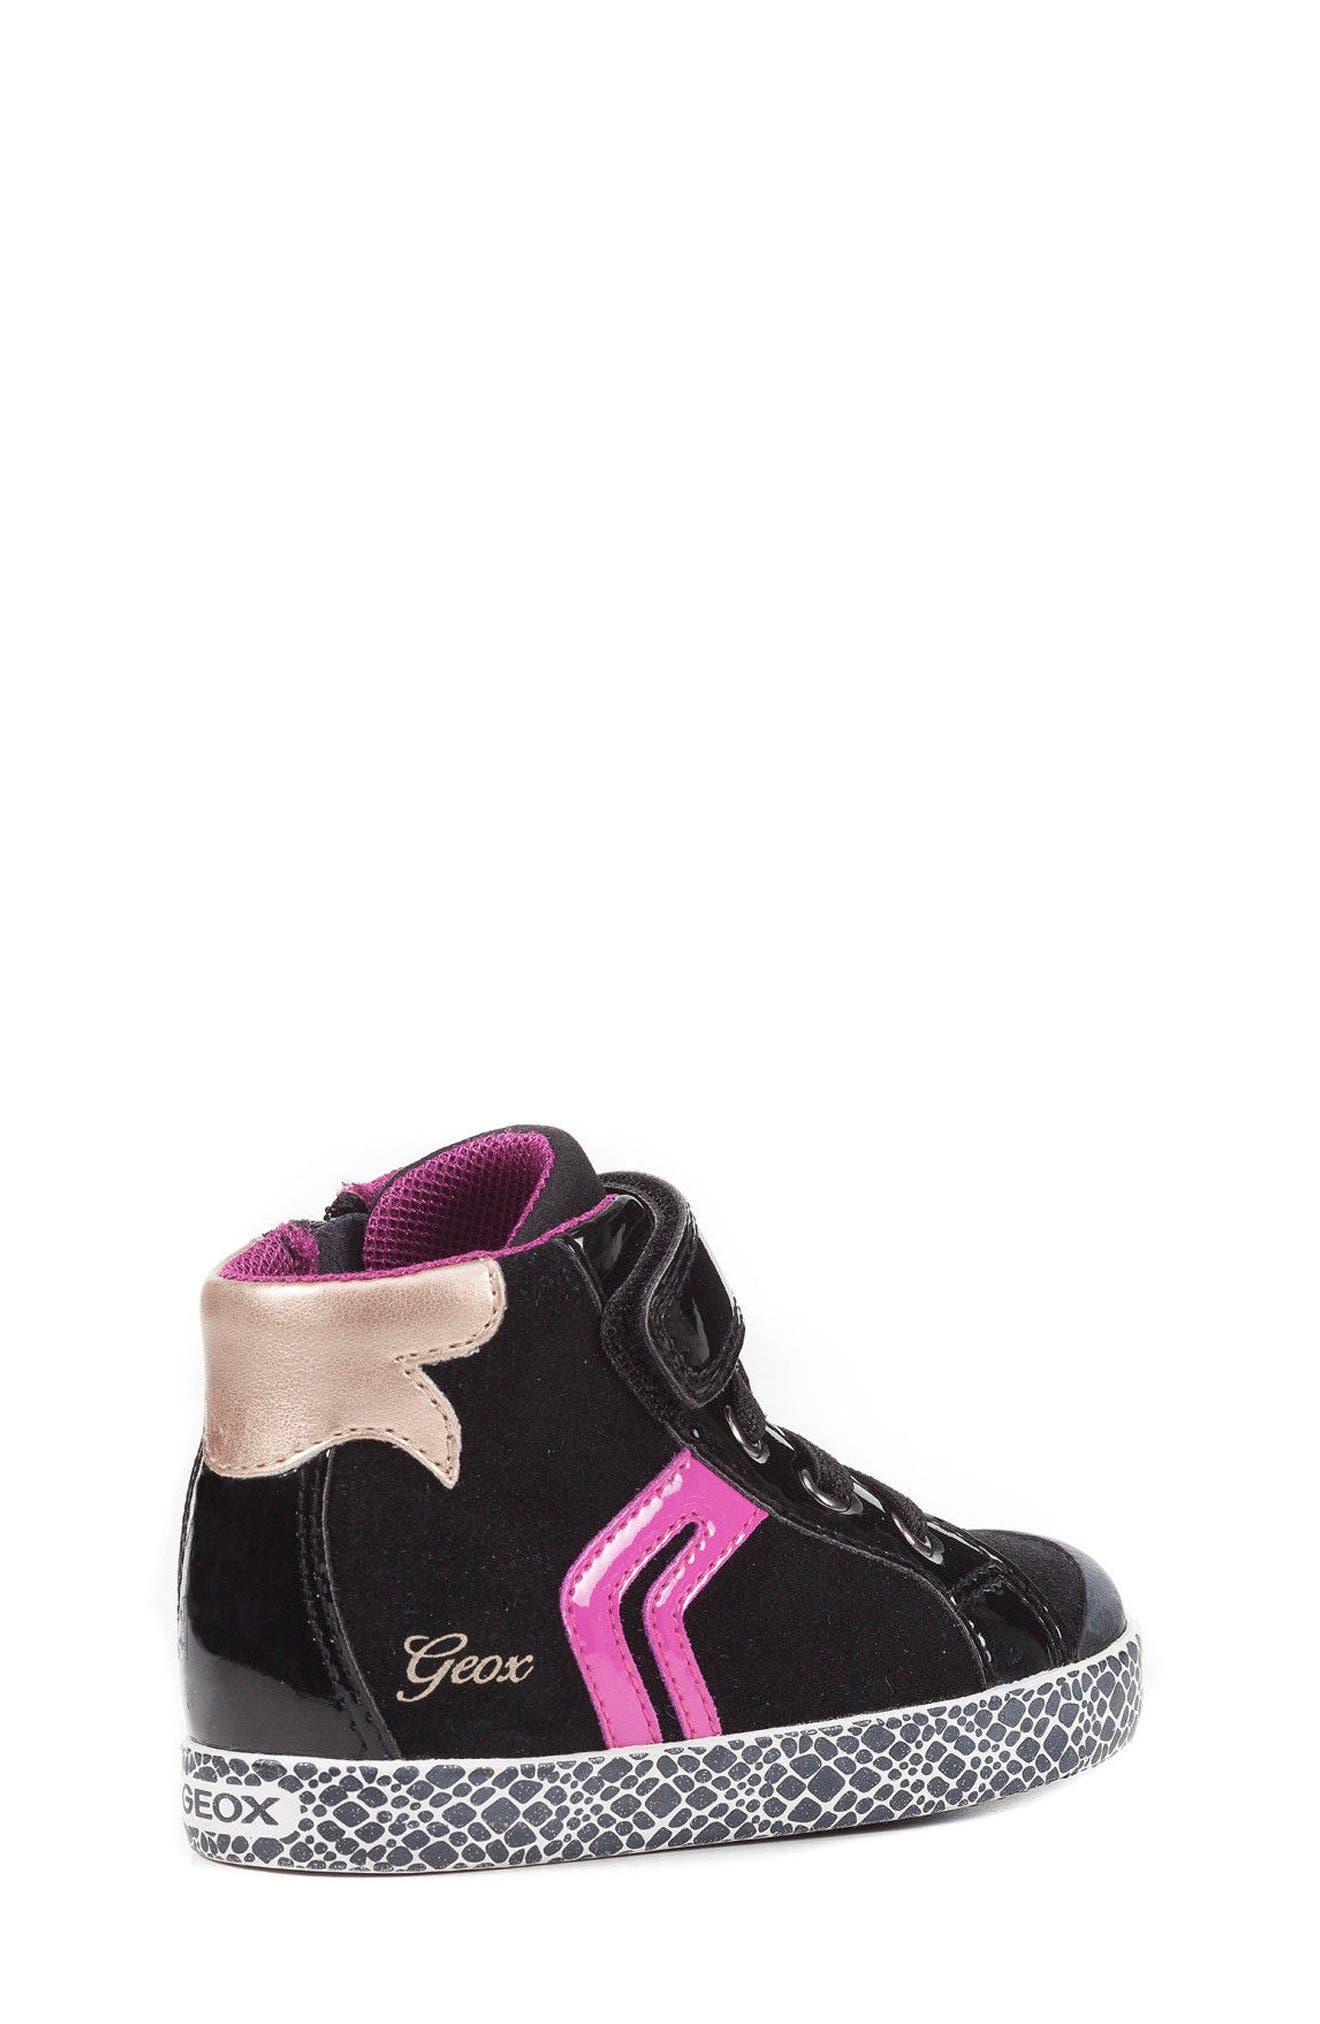 GEOX,                             Kiwi Girl High Top Sneaker,                             Alternate thumbnail 2, color,                             001